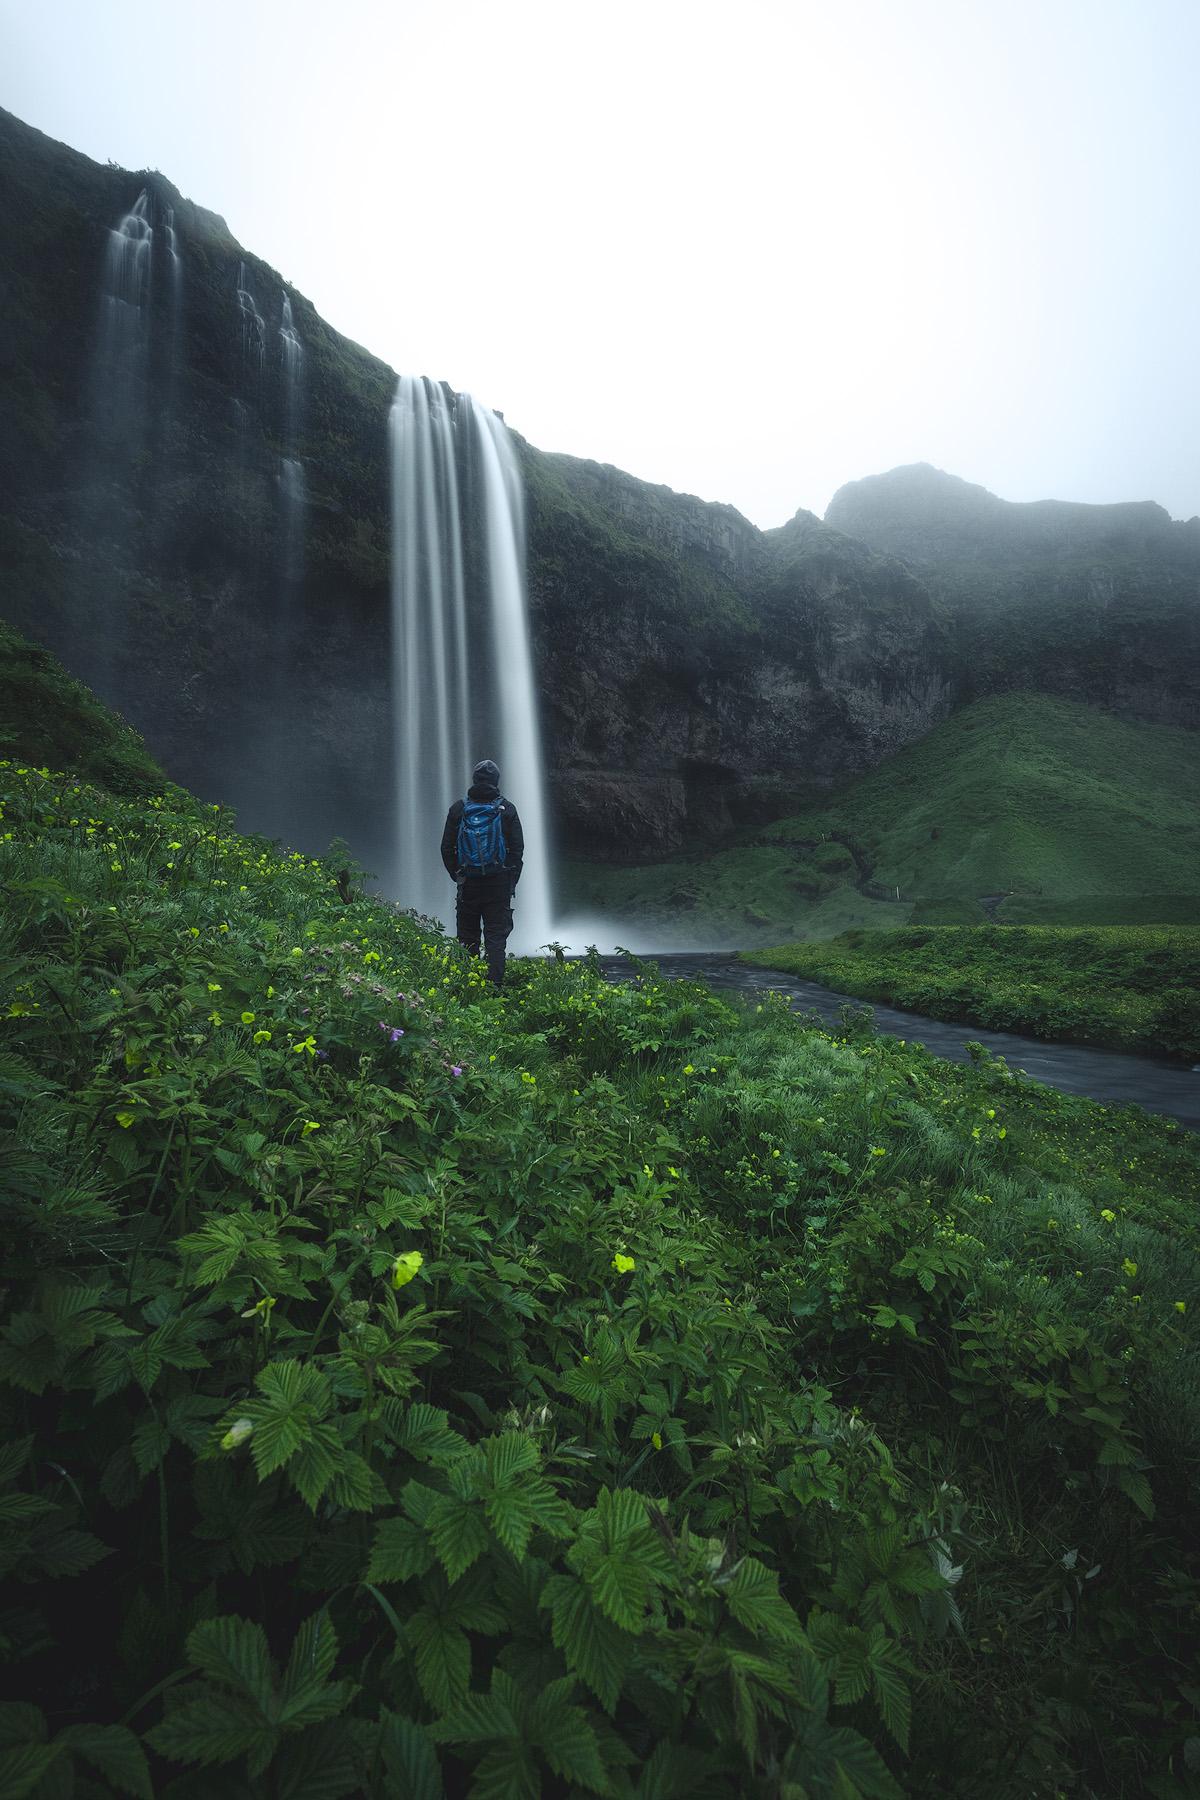 A self-portrait at the waterfalls of Seljalandsfoss.